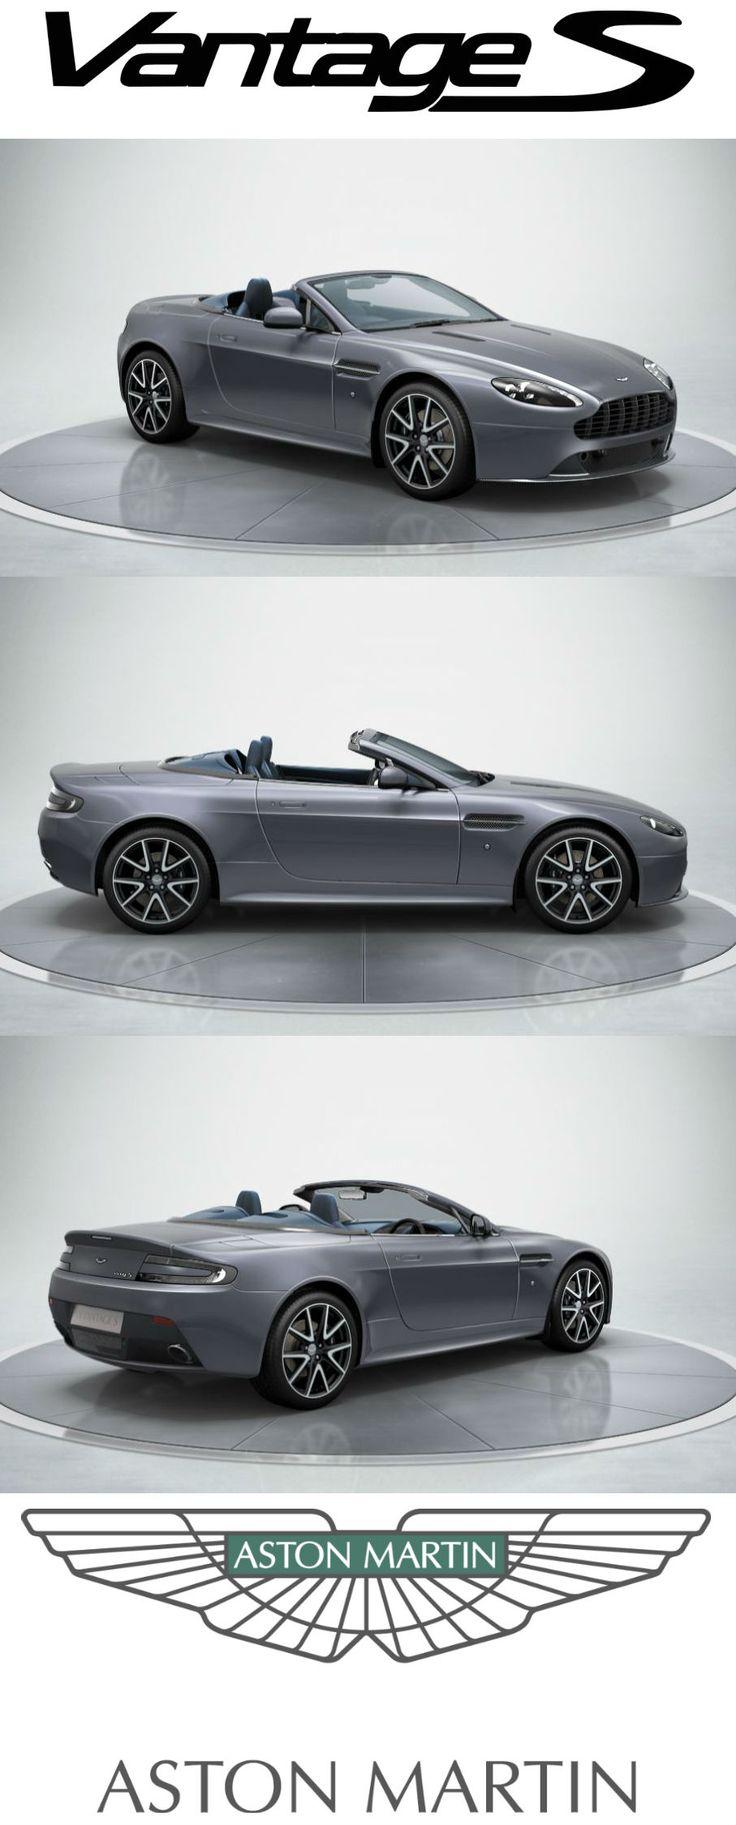 Aston martin v8 vantage s design your dream aston martin with our configurator http